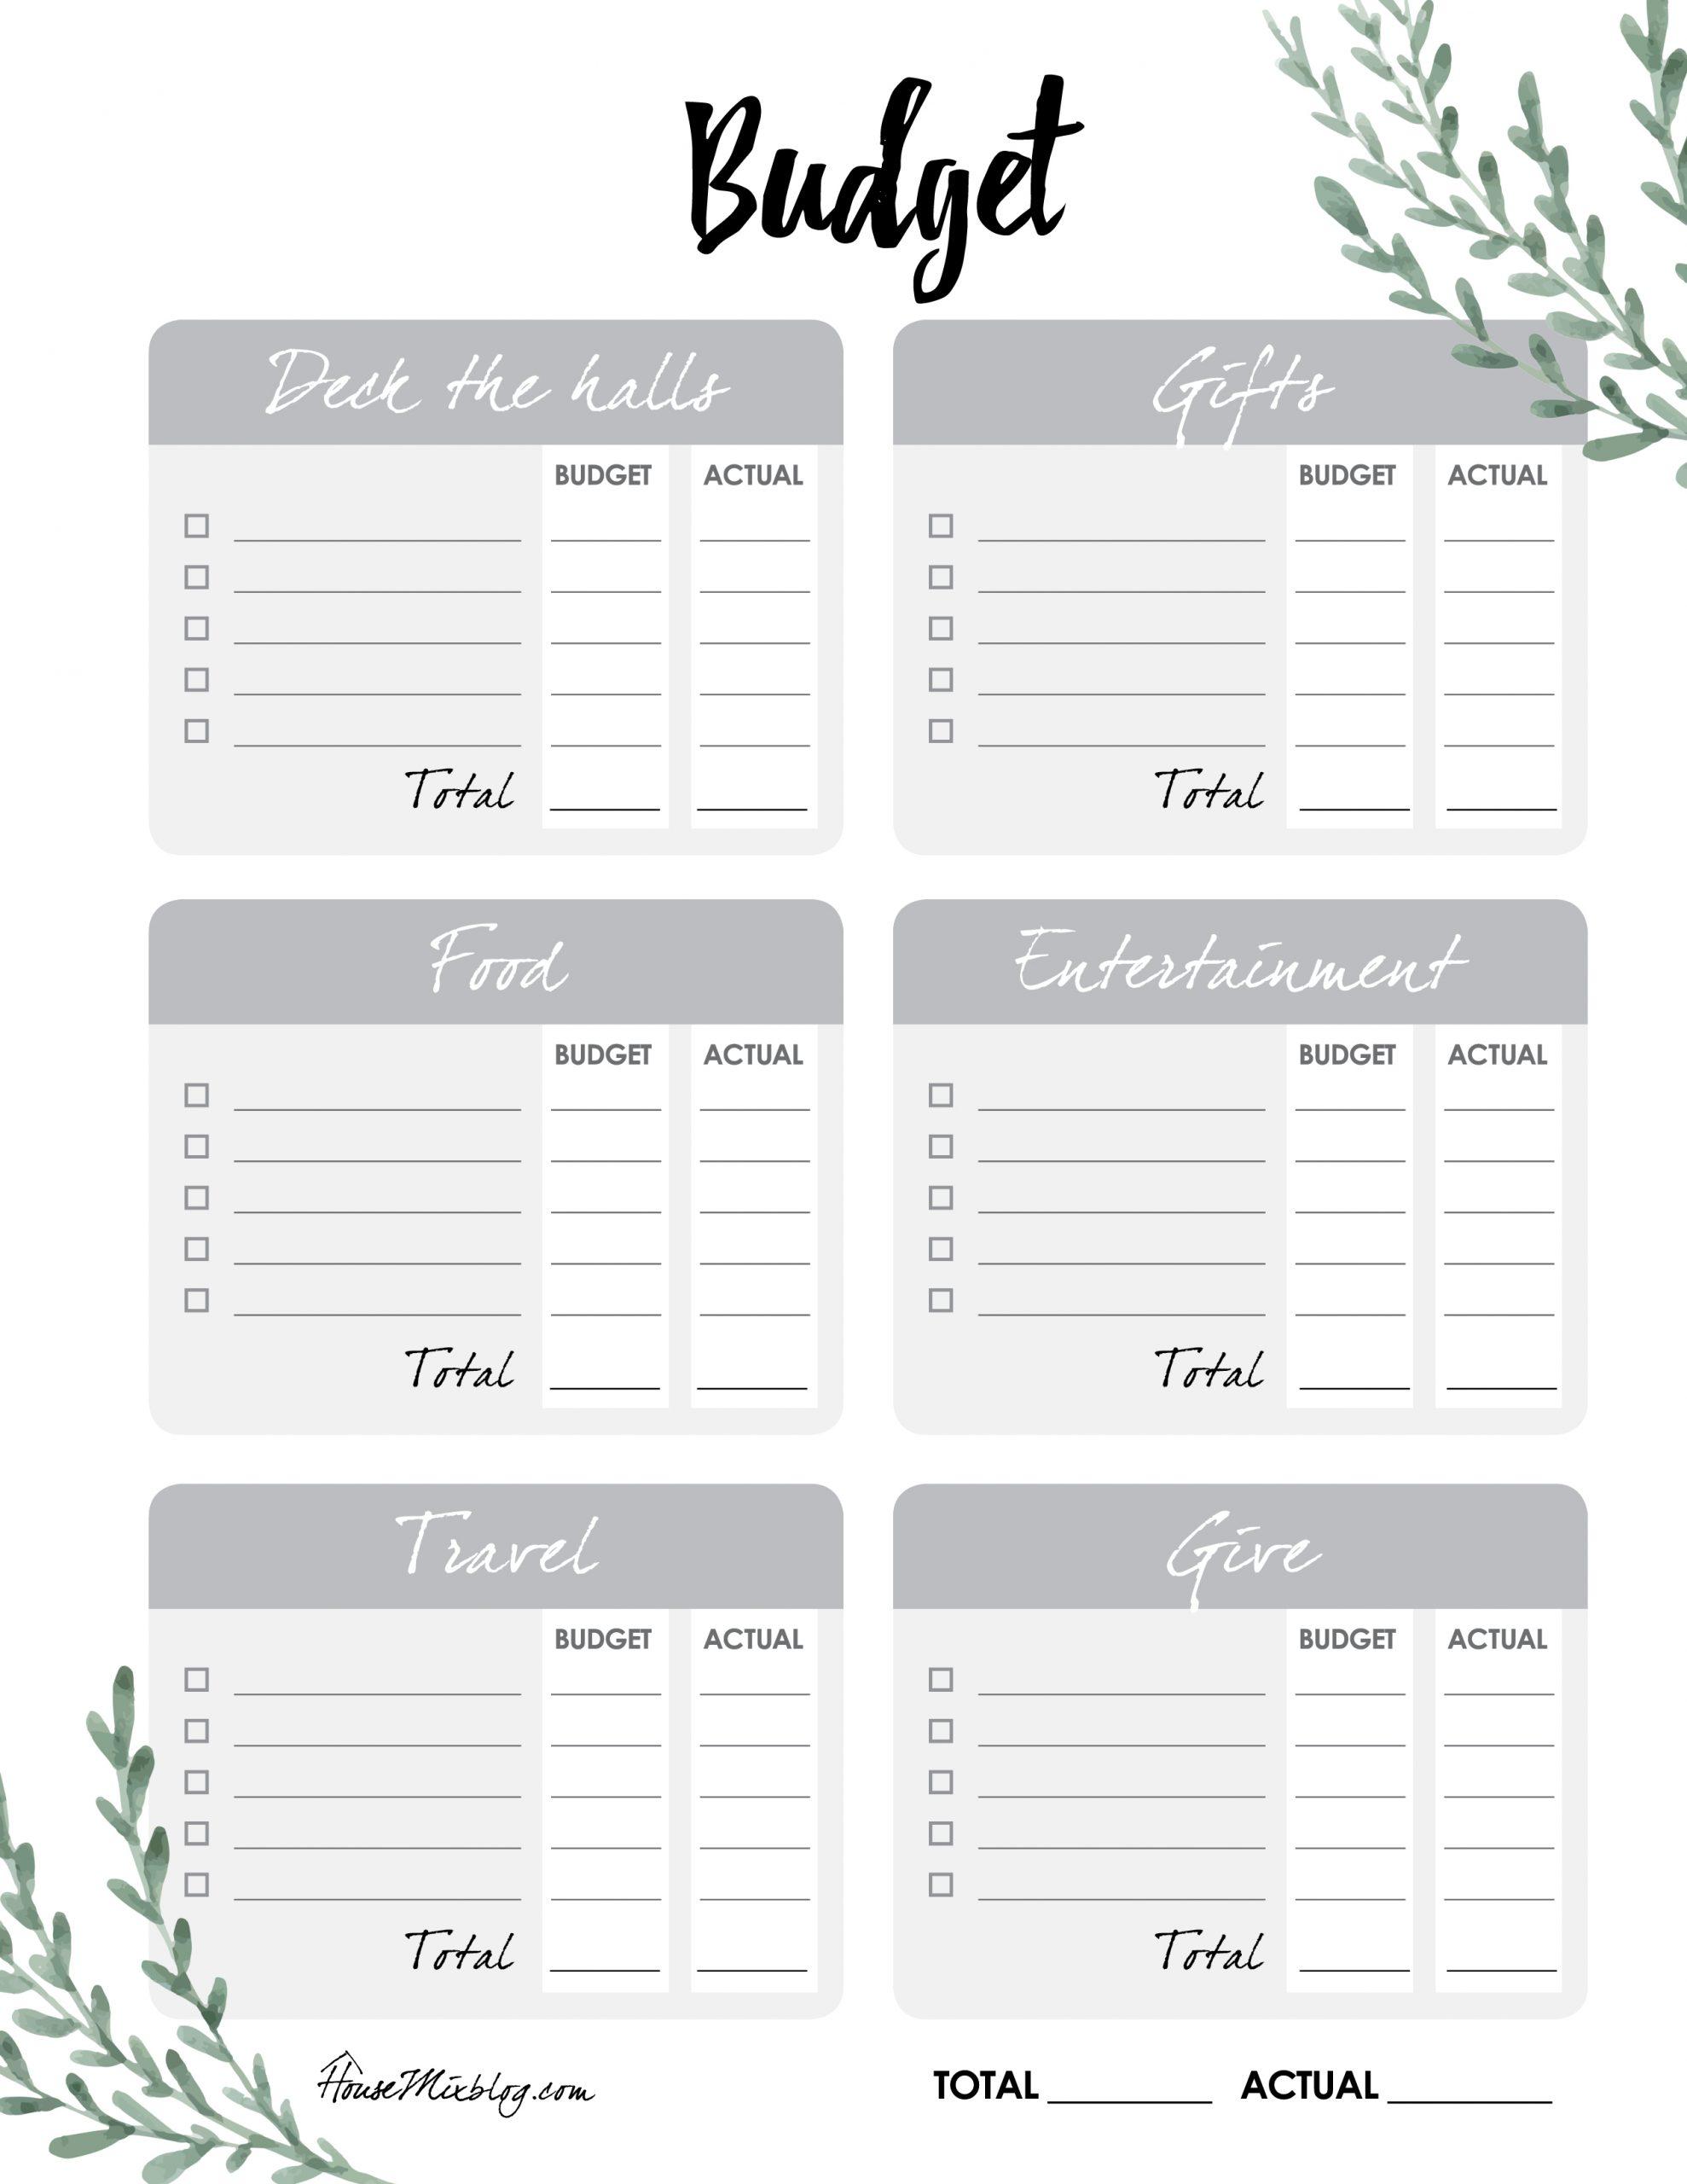 Printable Christmas planner budget worksheet checklist